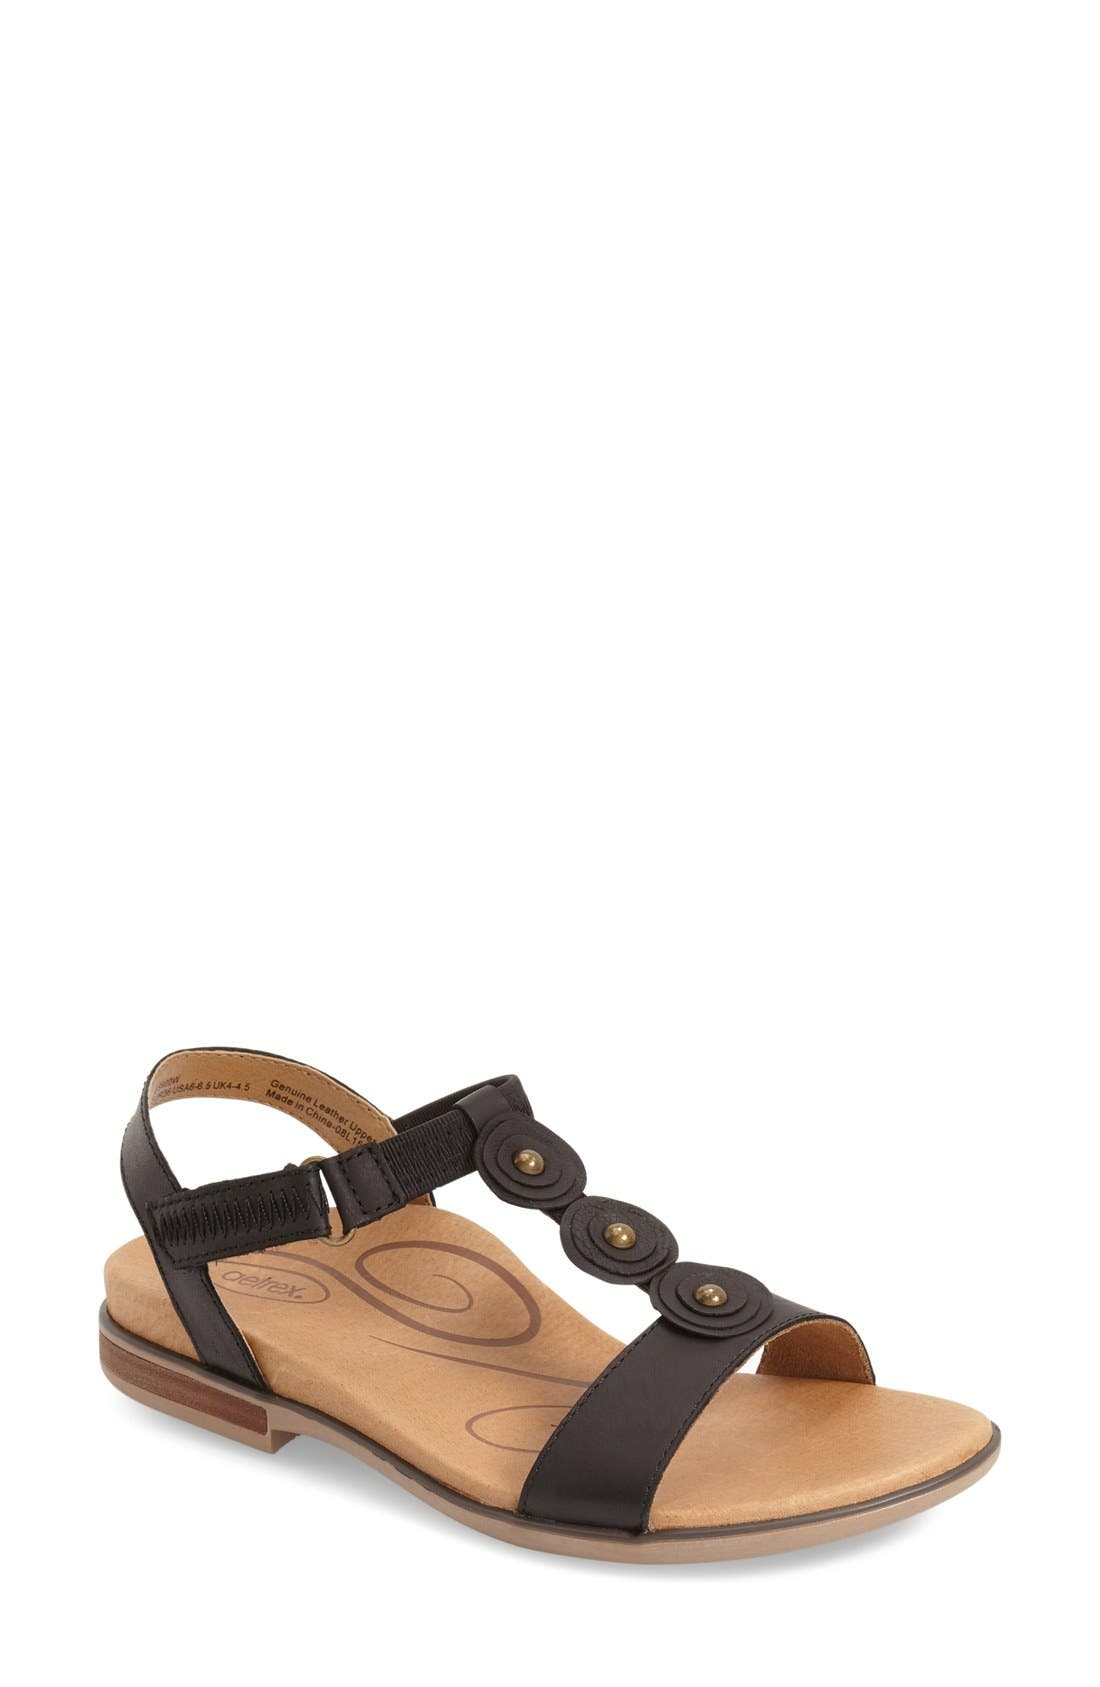 'Sharon' T-Strap Sandal,                         Main,                         color, 001